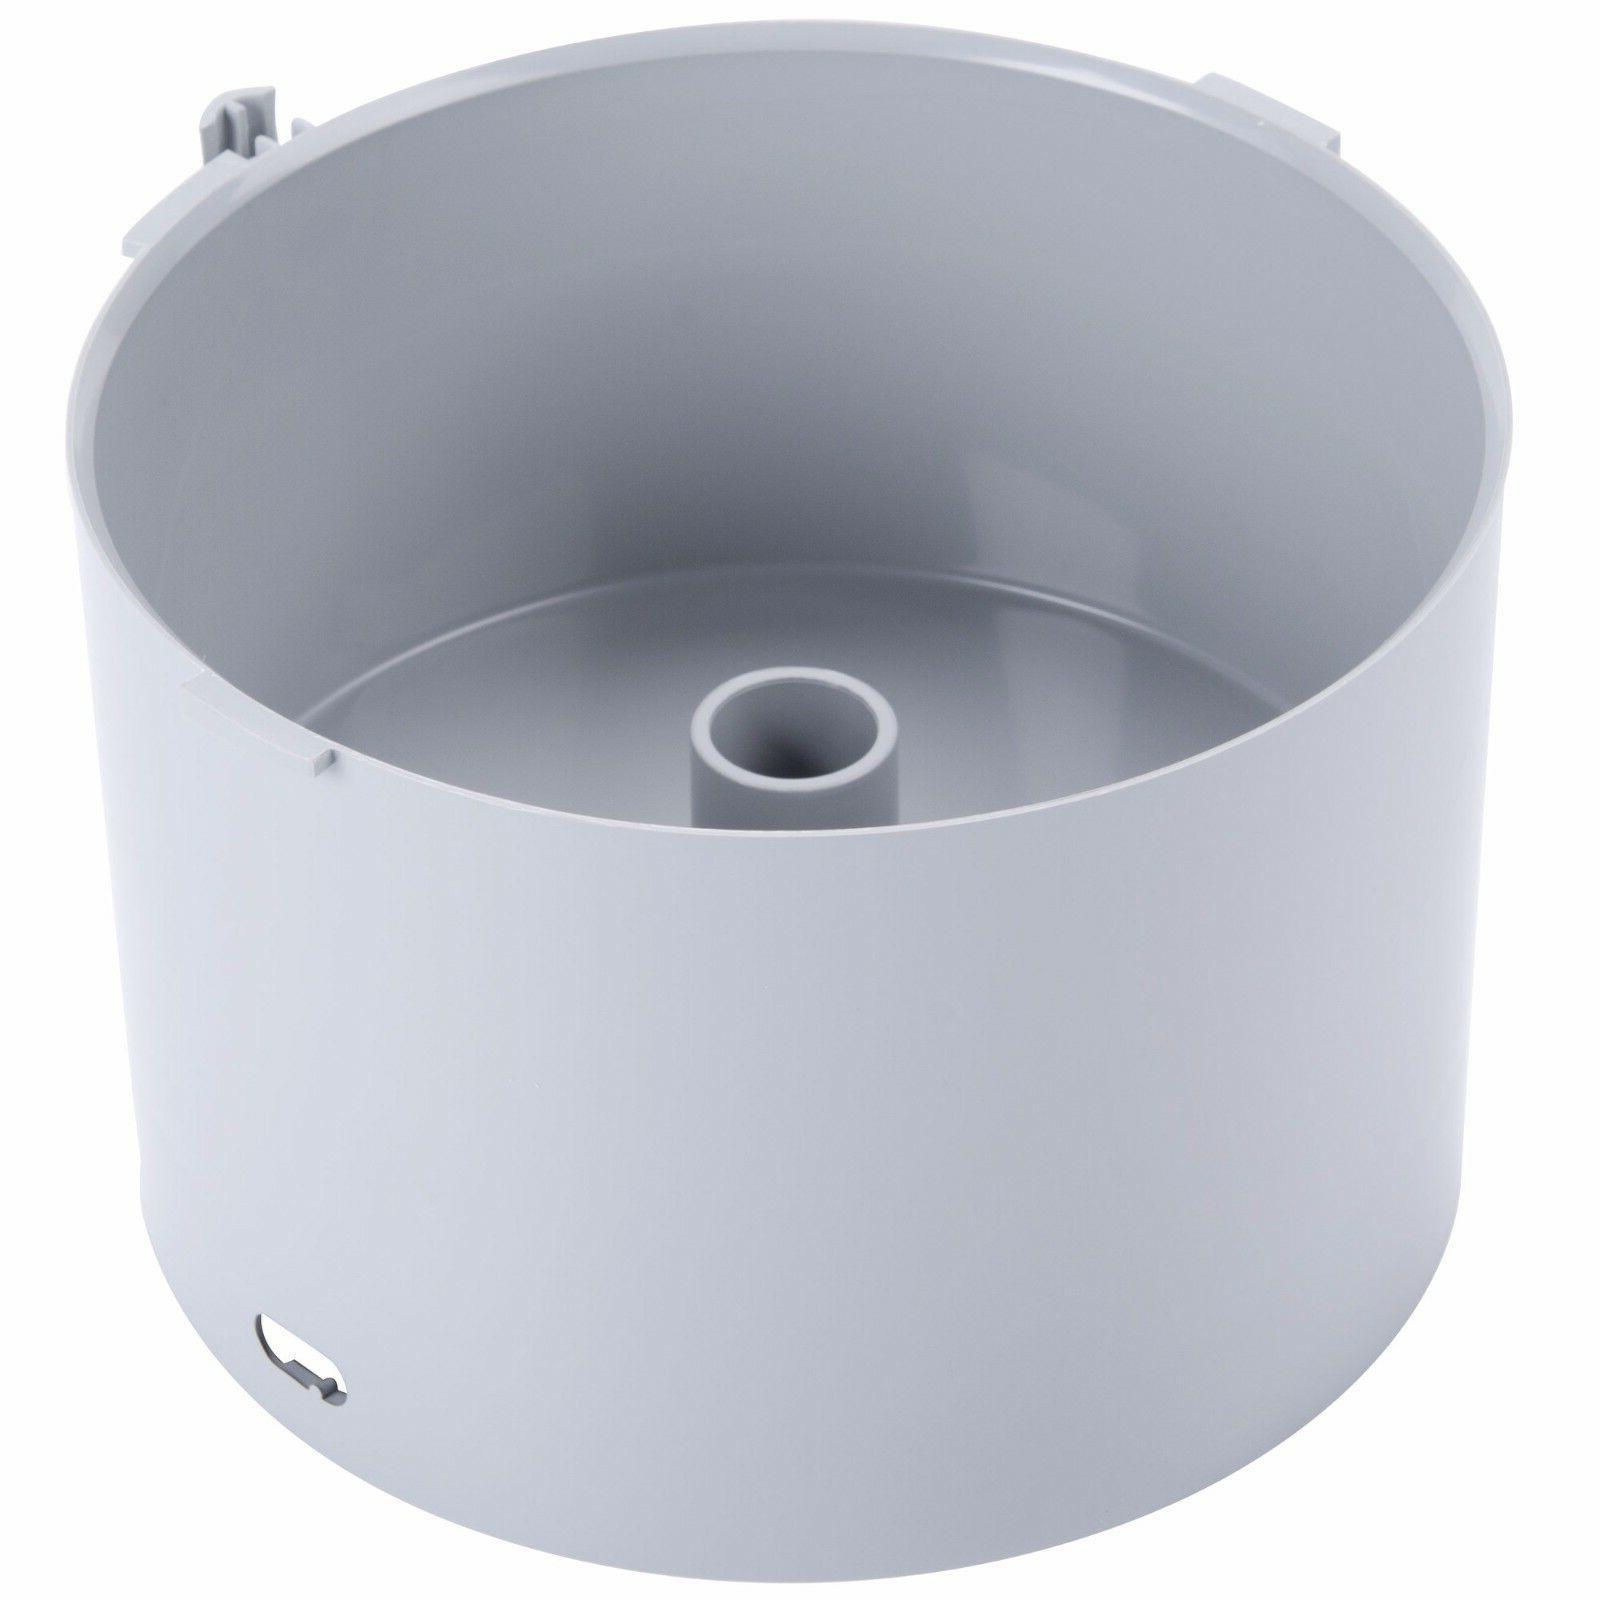 Robot Coupe 102702 R100 R101 Food Processor Gray Bowl 2.5 Qu